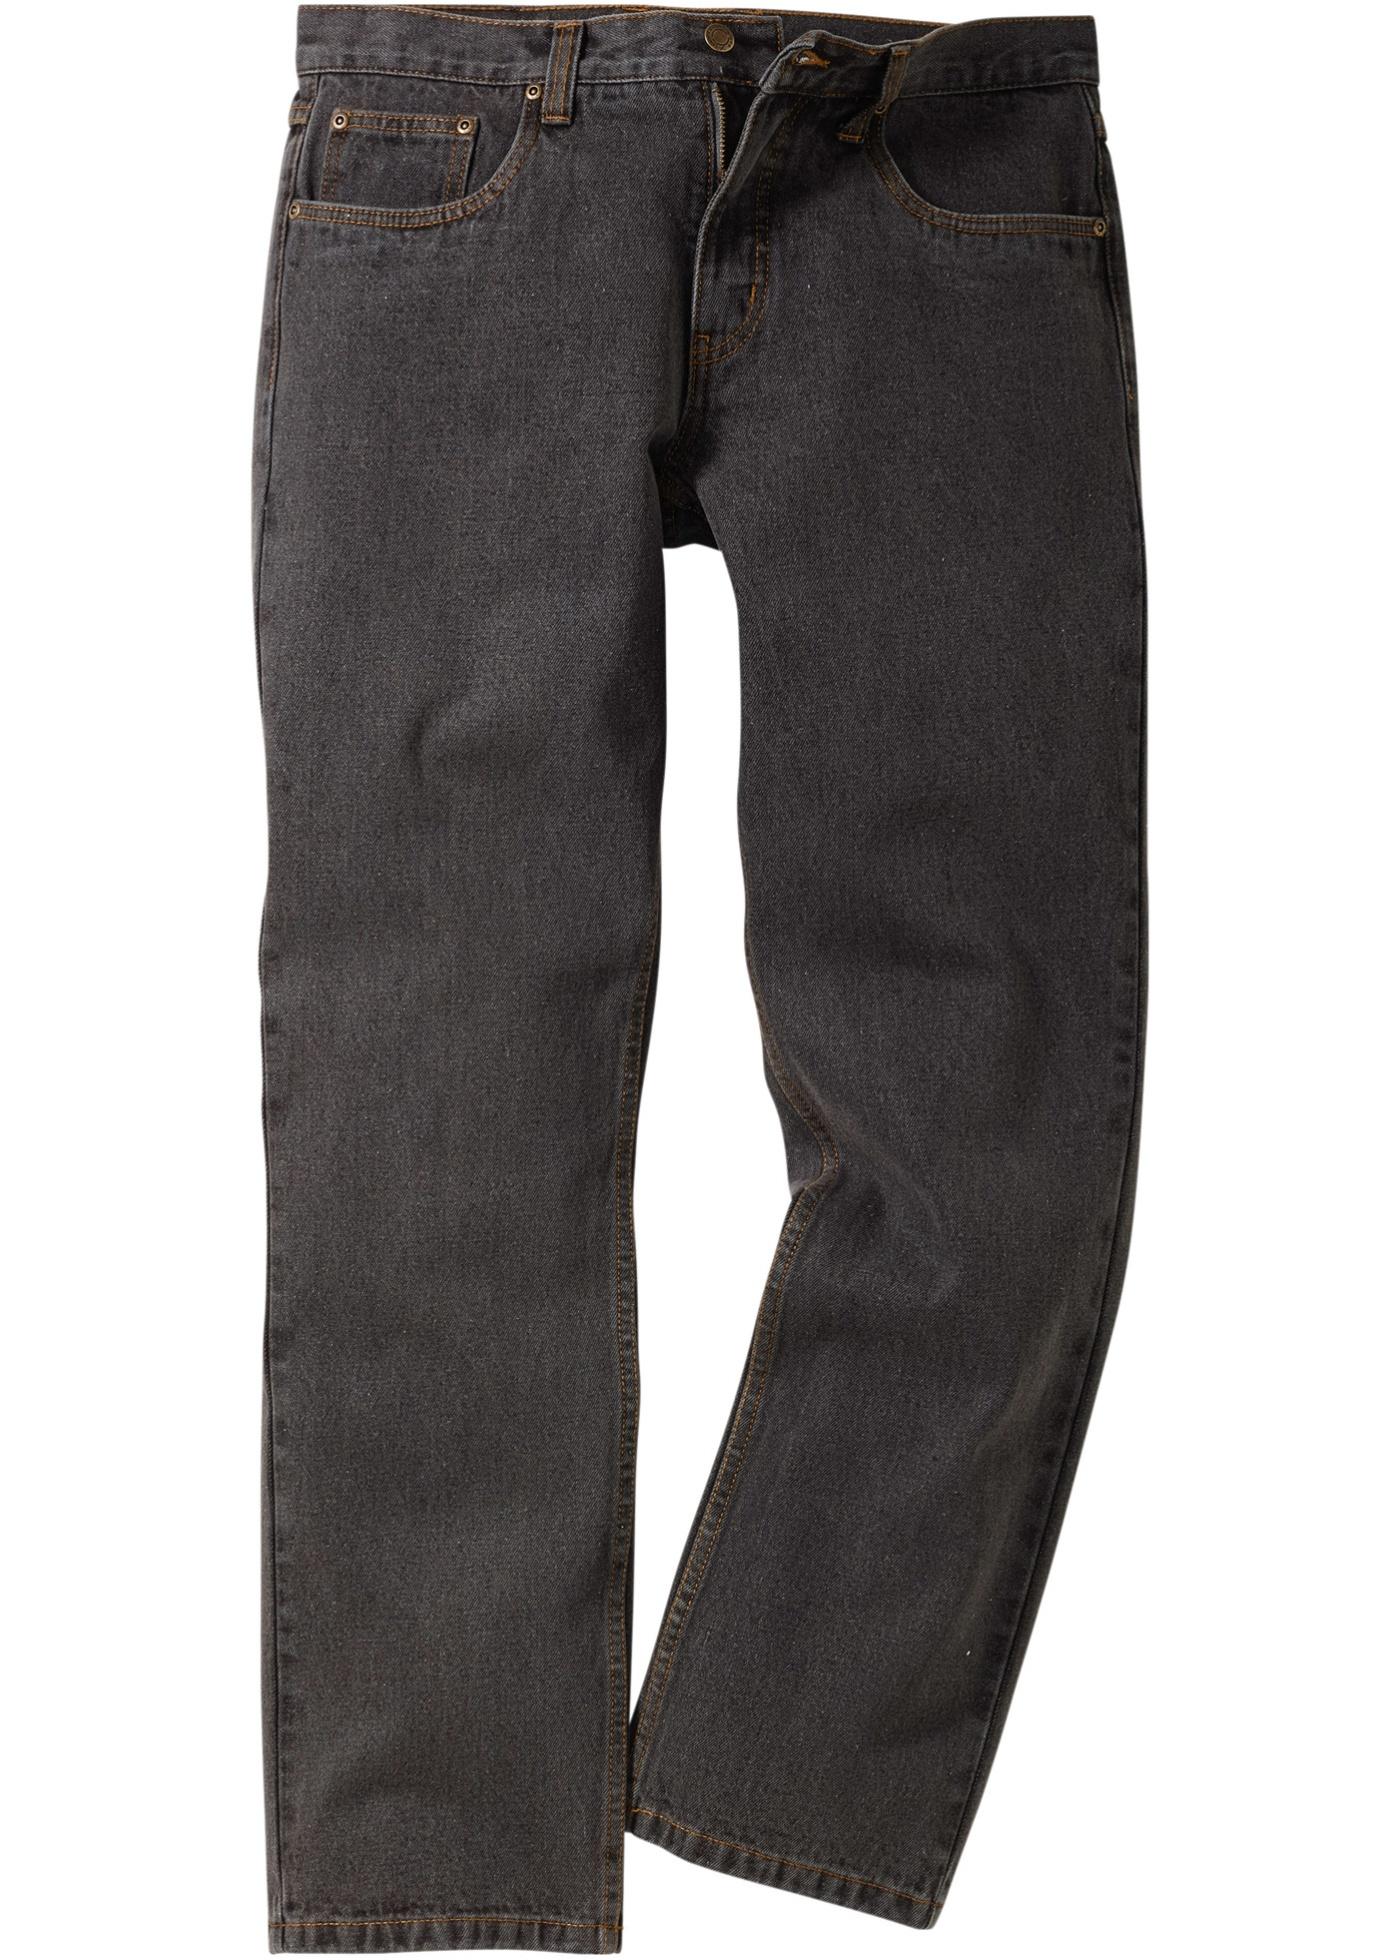 Jeans Regular Fit Straight, U+S-Größe